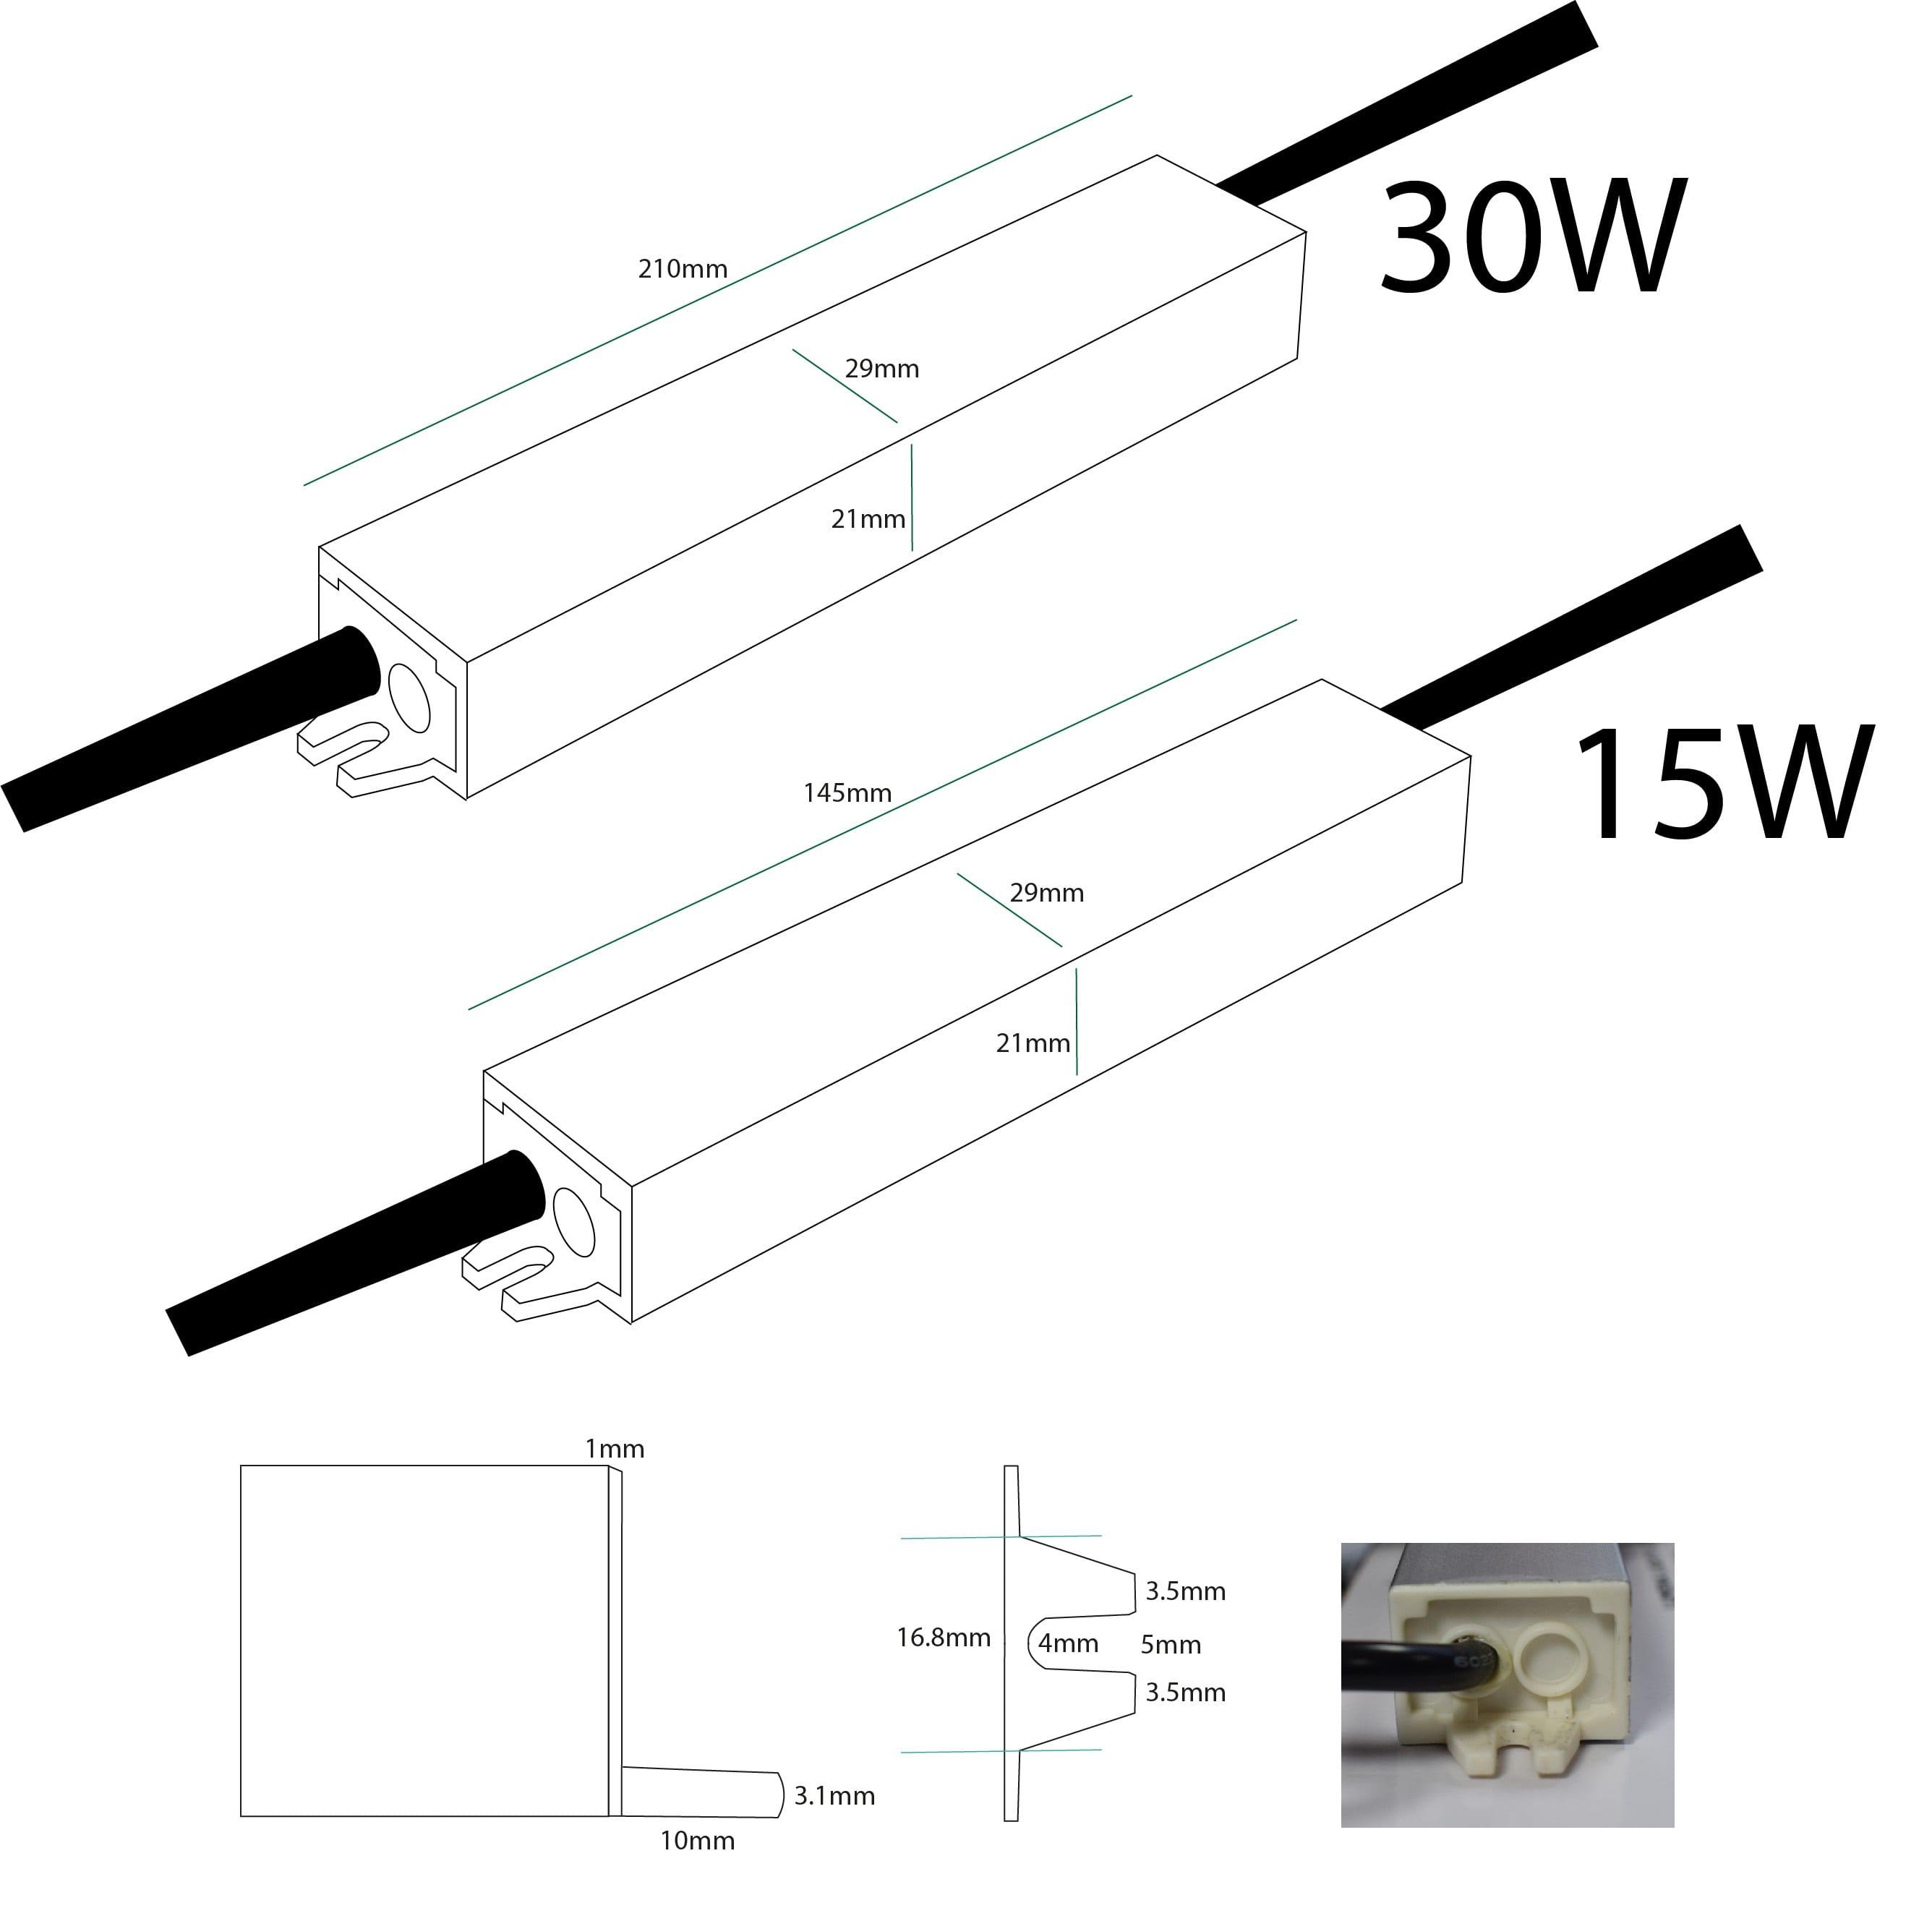 wiring a mains plug adaptor